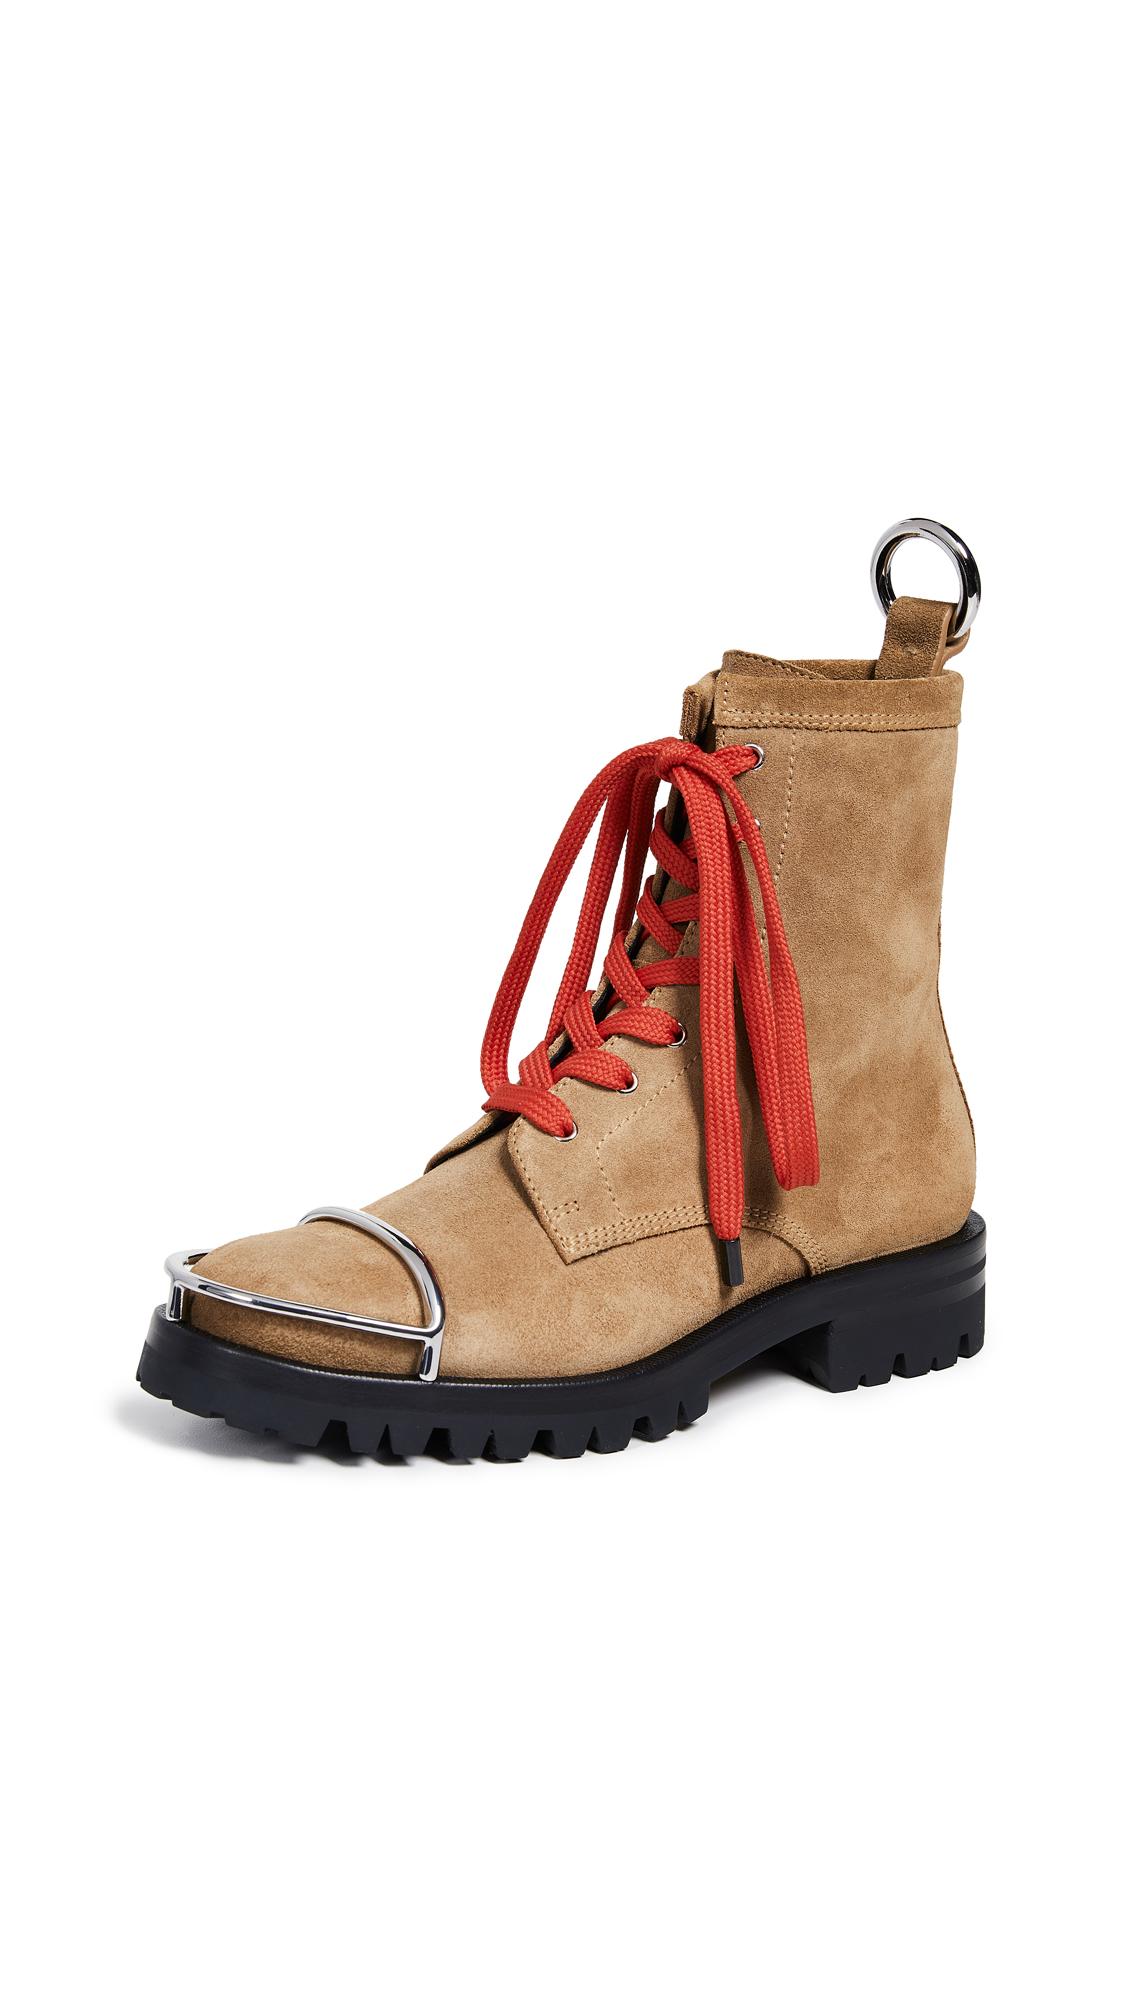 Alexander Wang Lyndon Boots - Clay